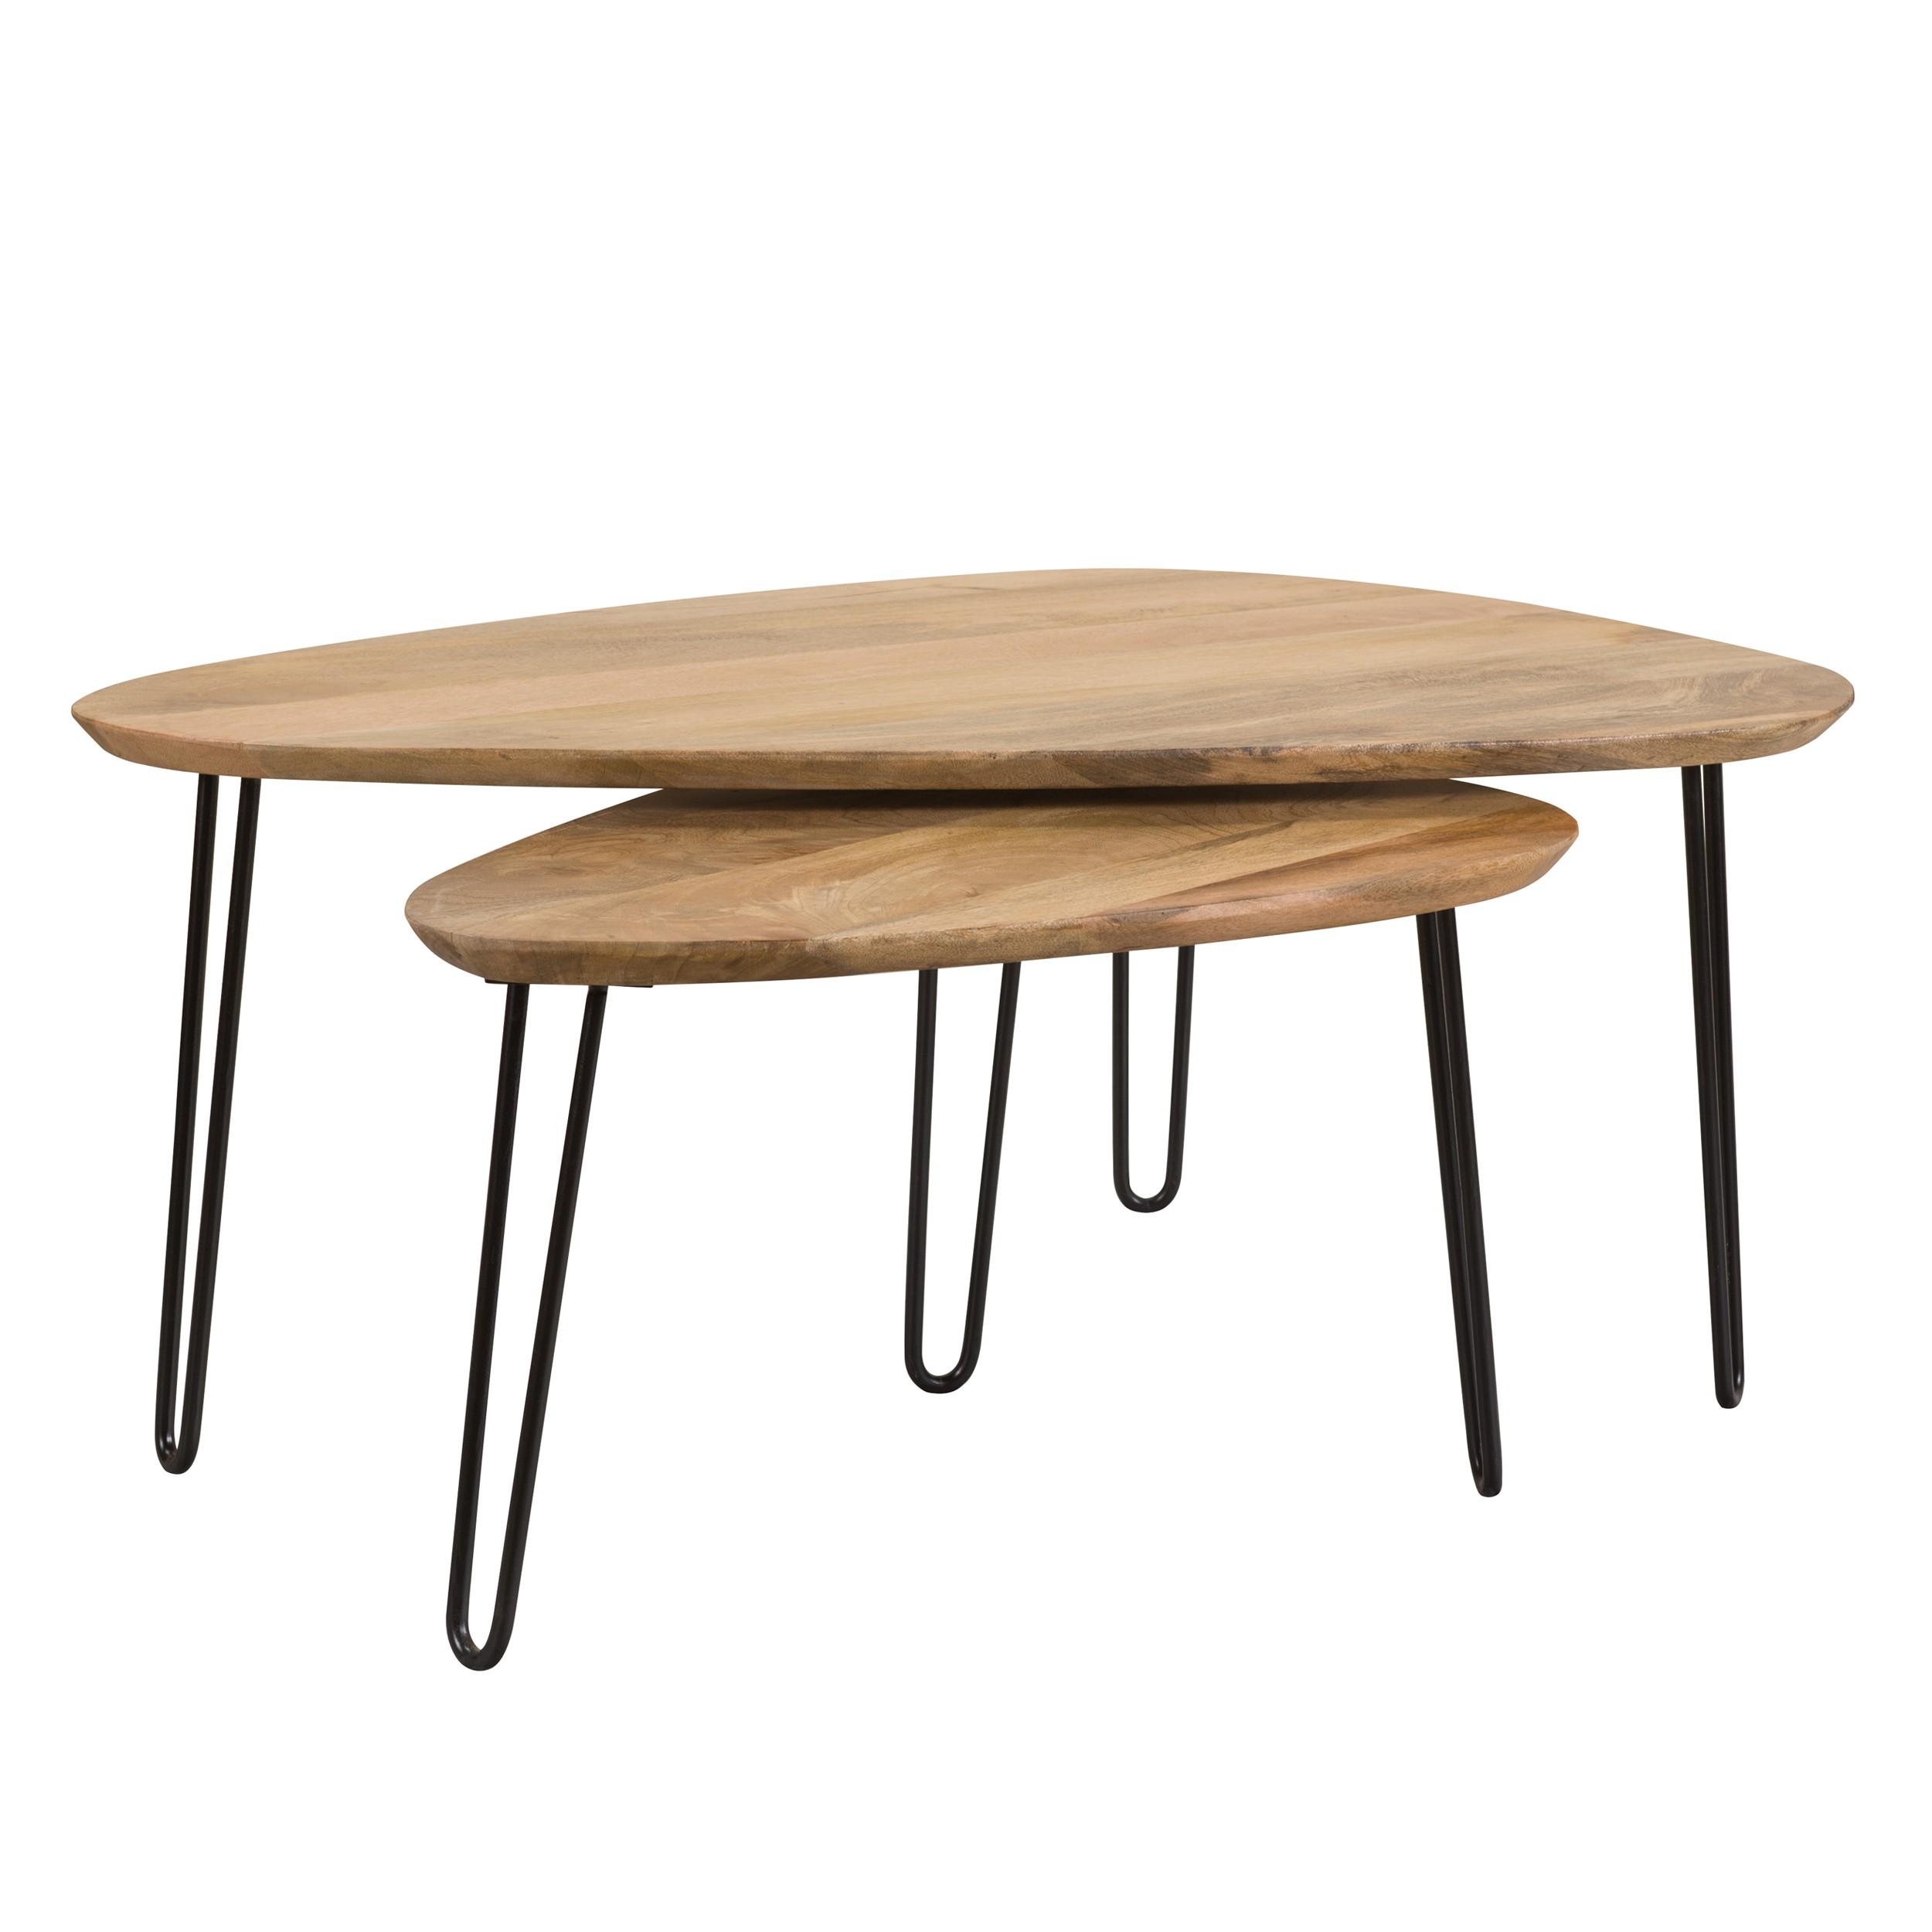 Table Basse Gigogne Bois.Table Basse Gigogne Kiwi En Bois Lot De 2